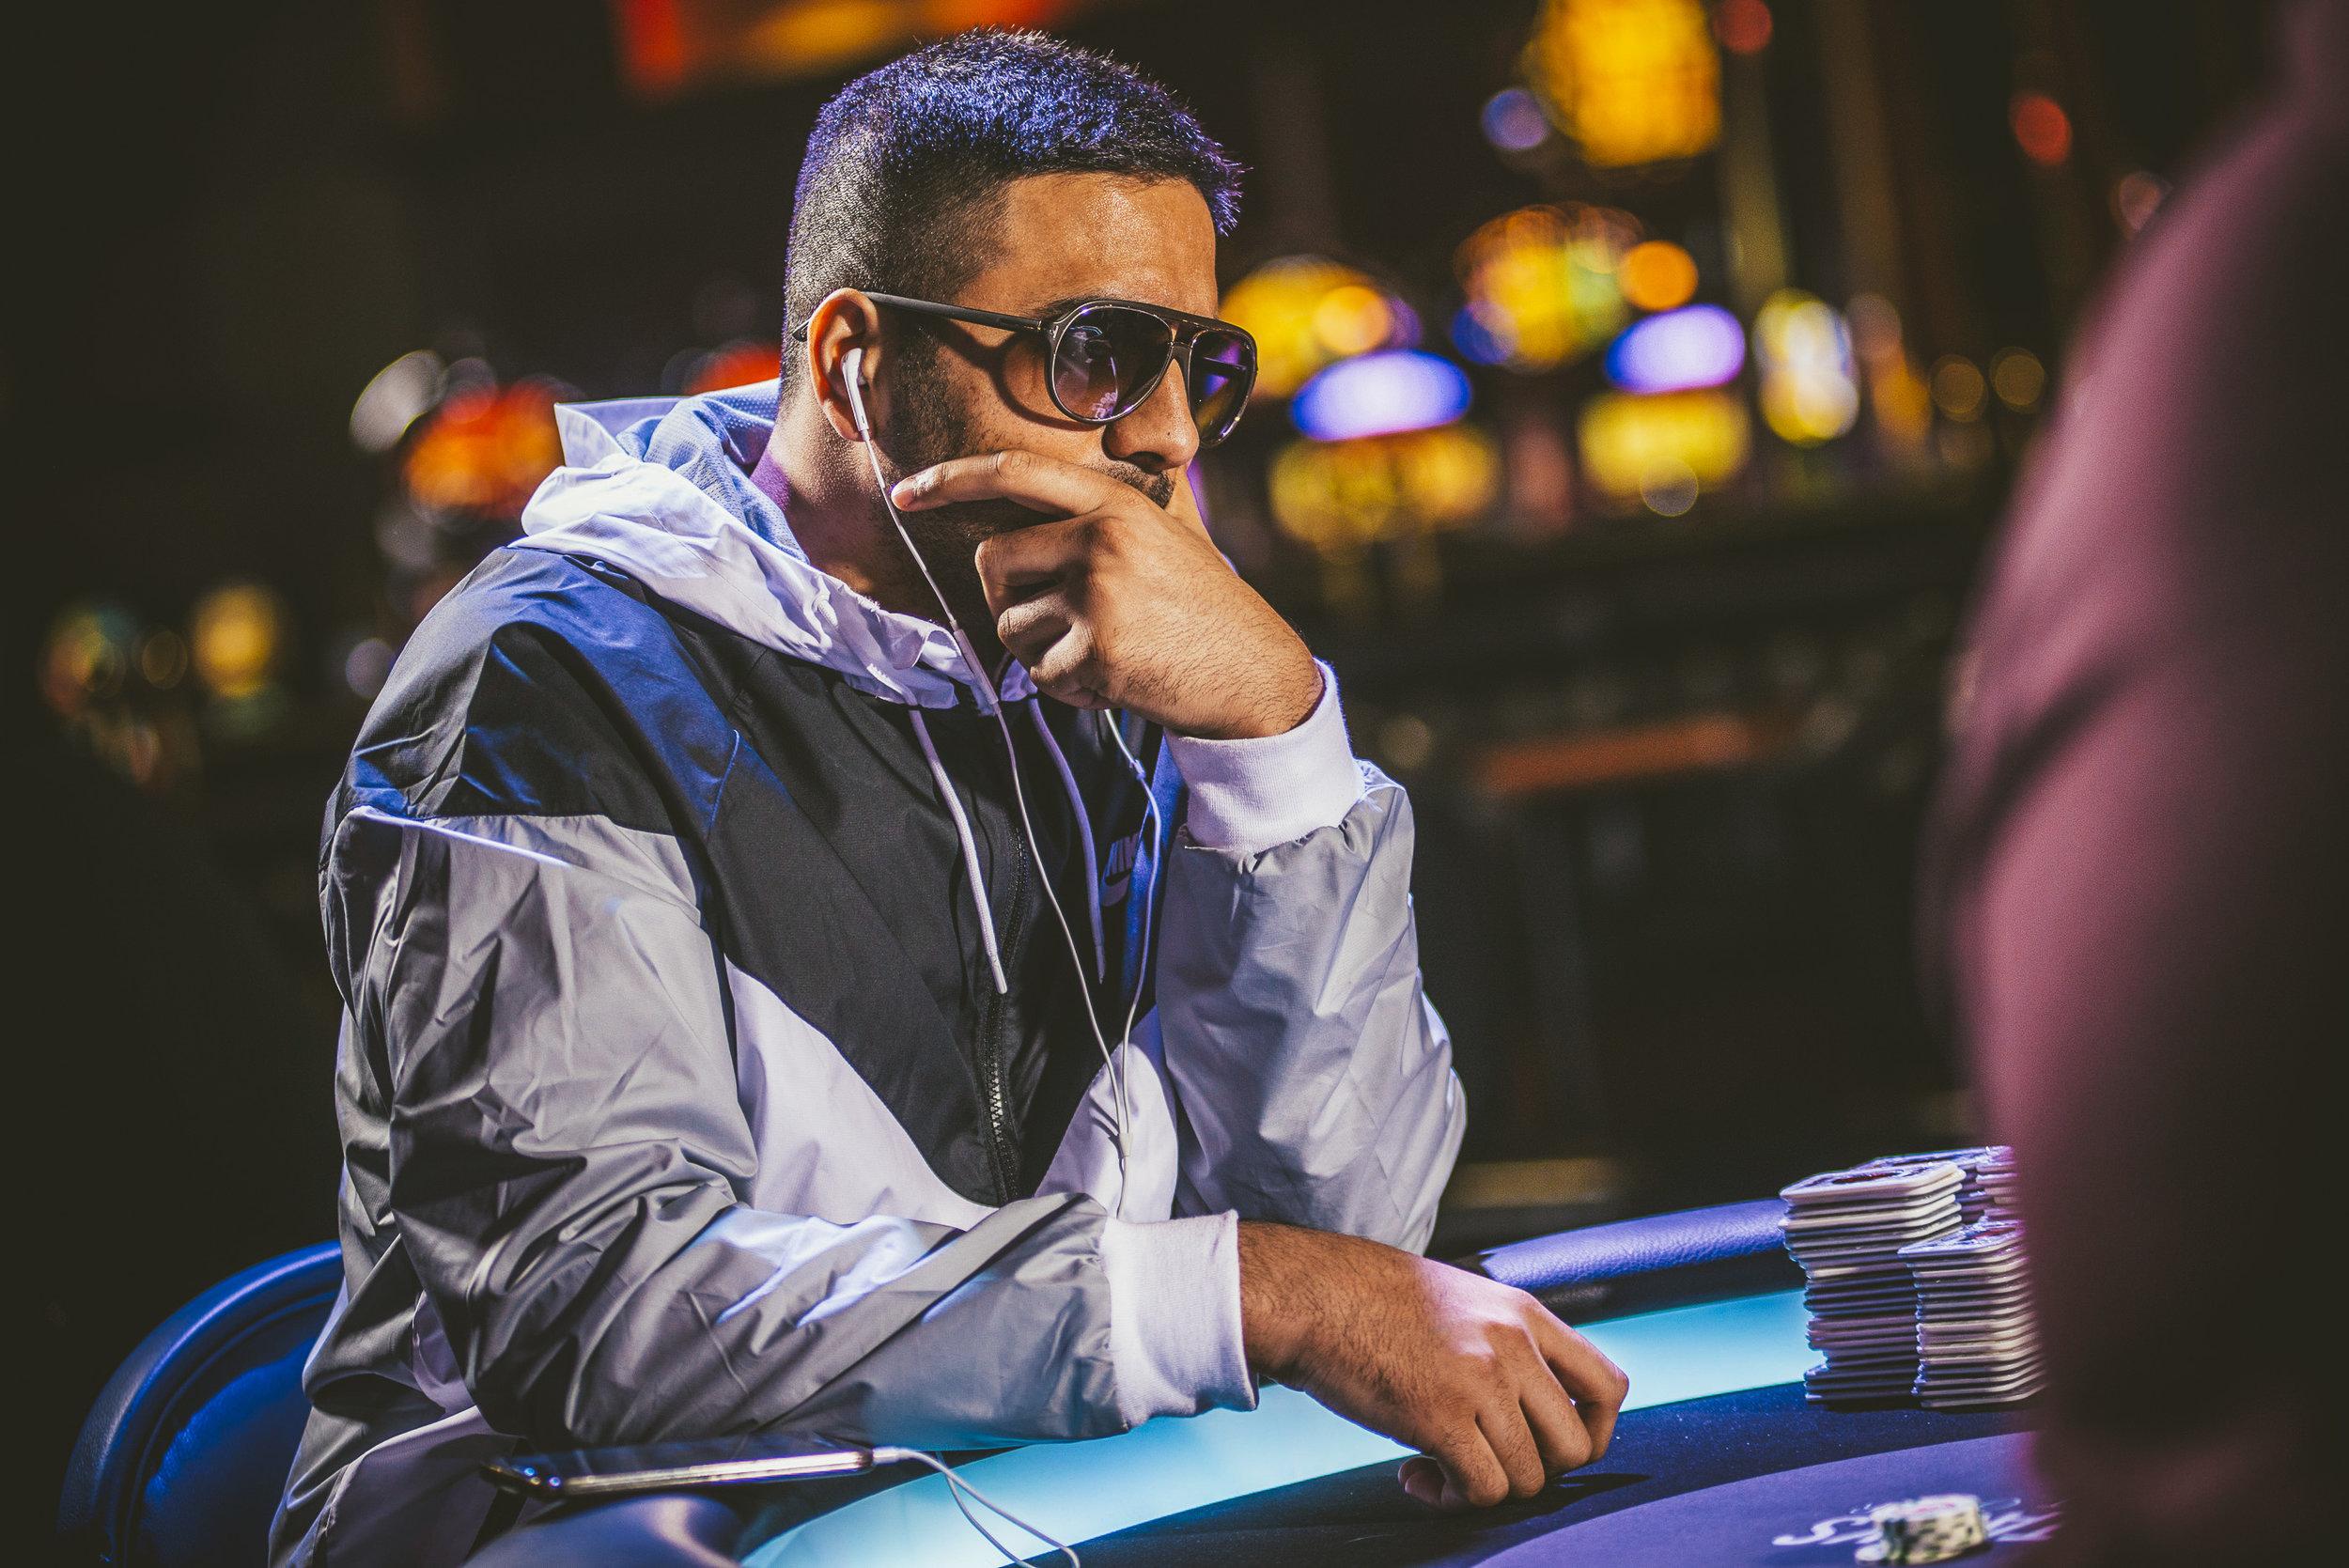 DeepStacks Poker Tour_Amardeep Randhawa_Amato_AA42968.jpg